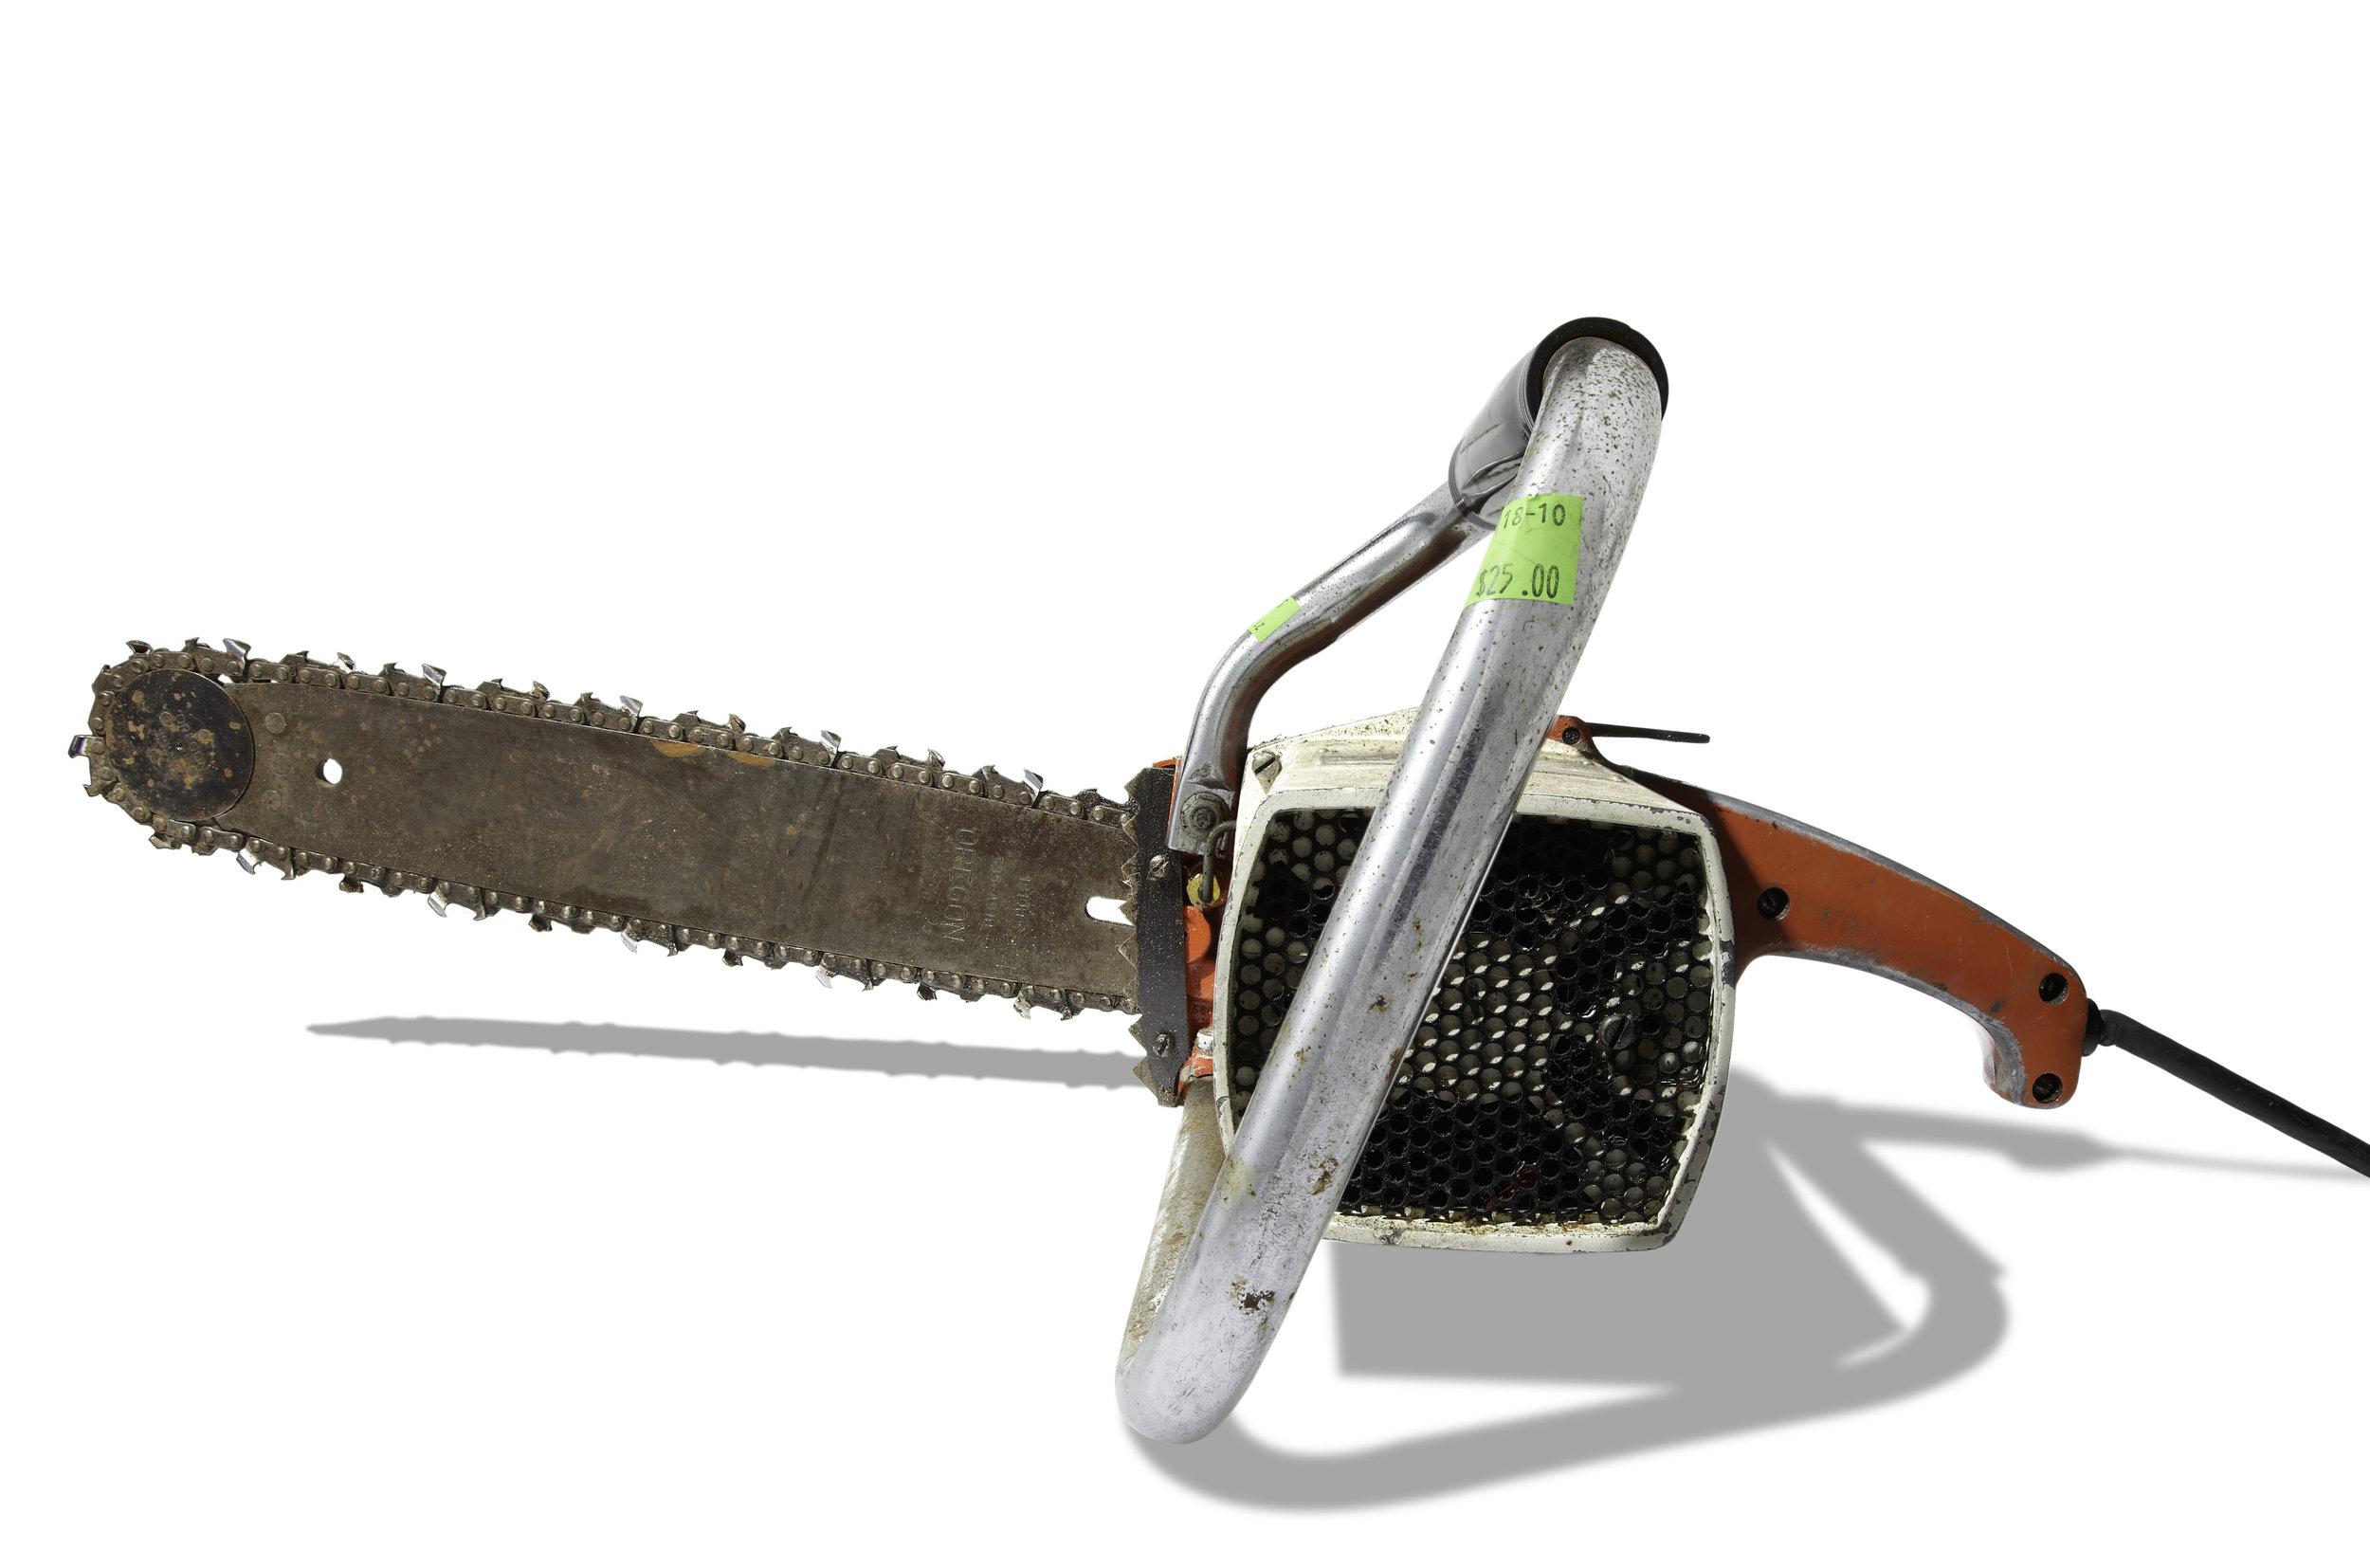 Chainsaw11.1.14.jpg